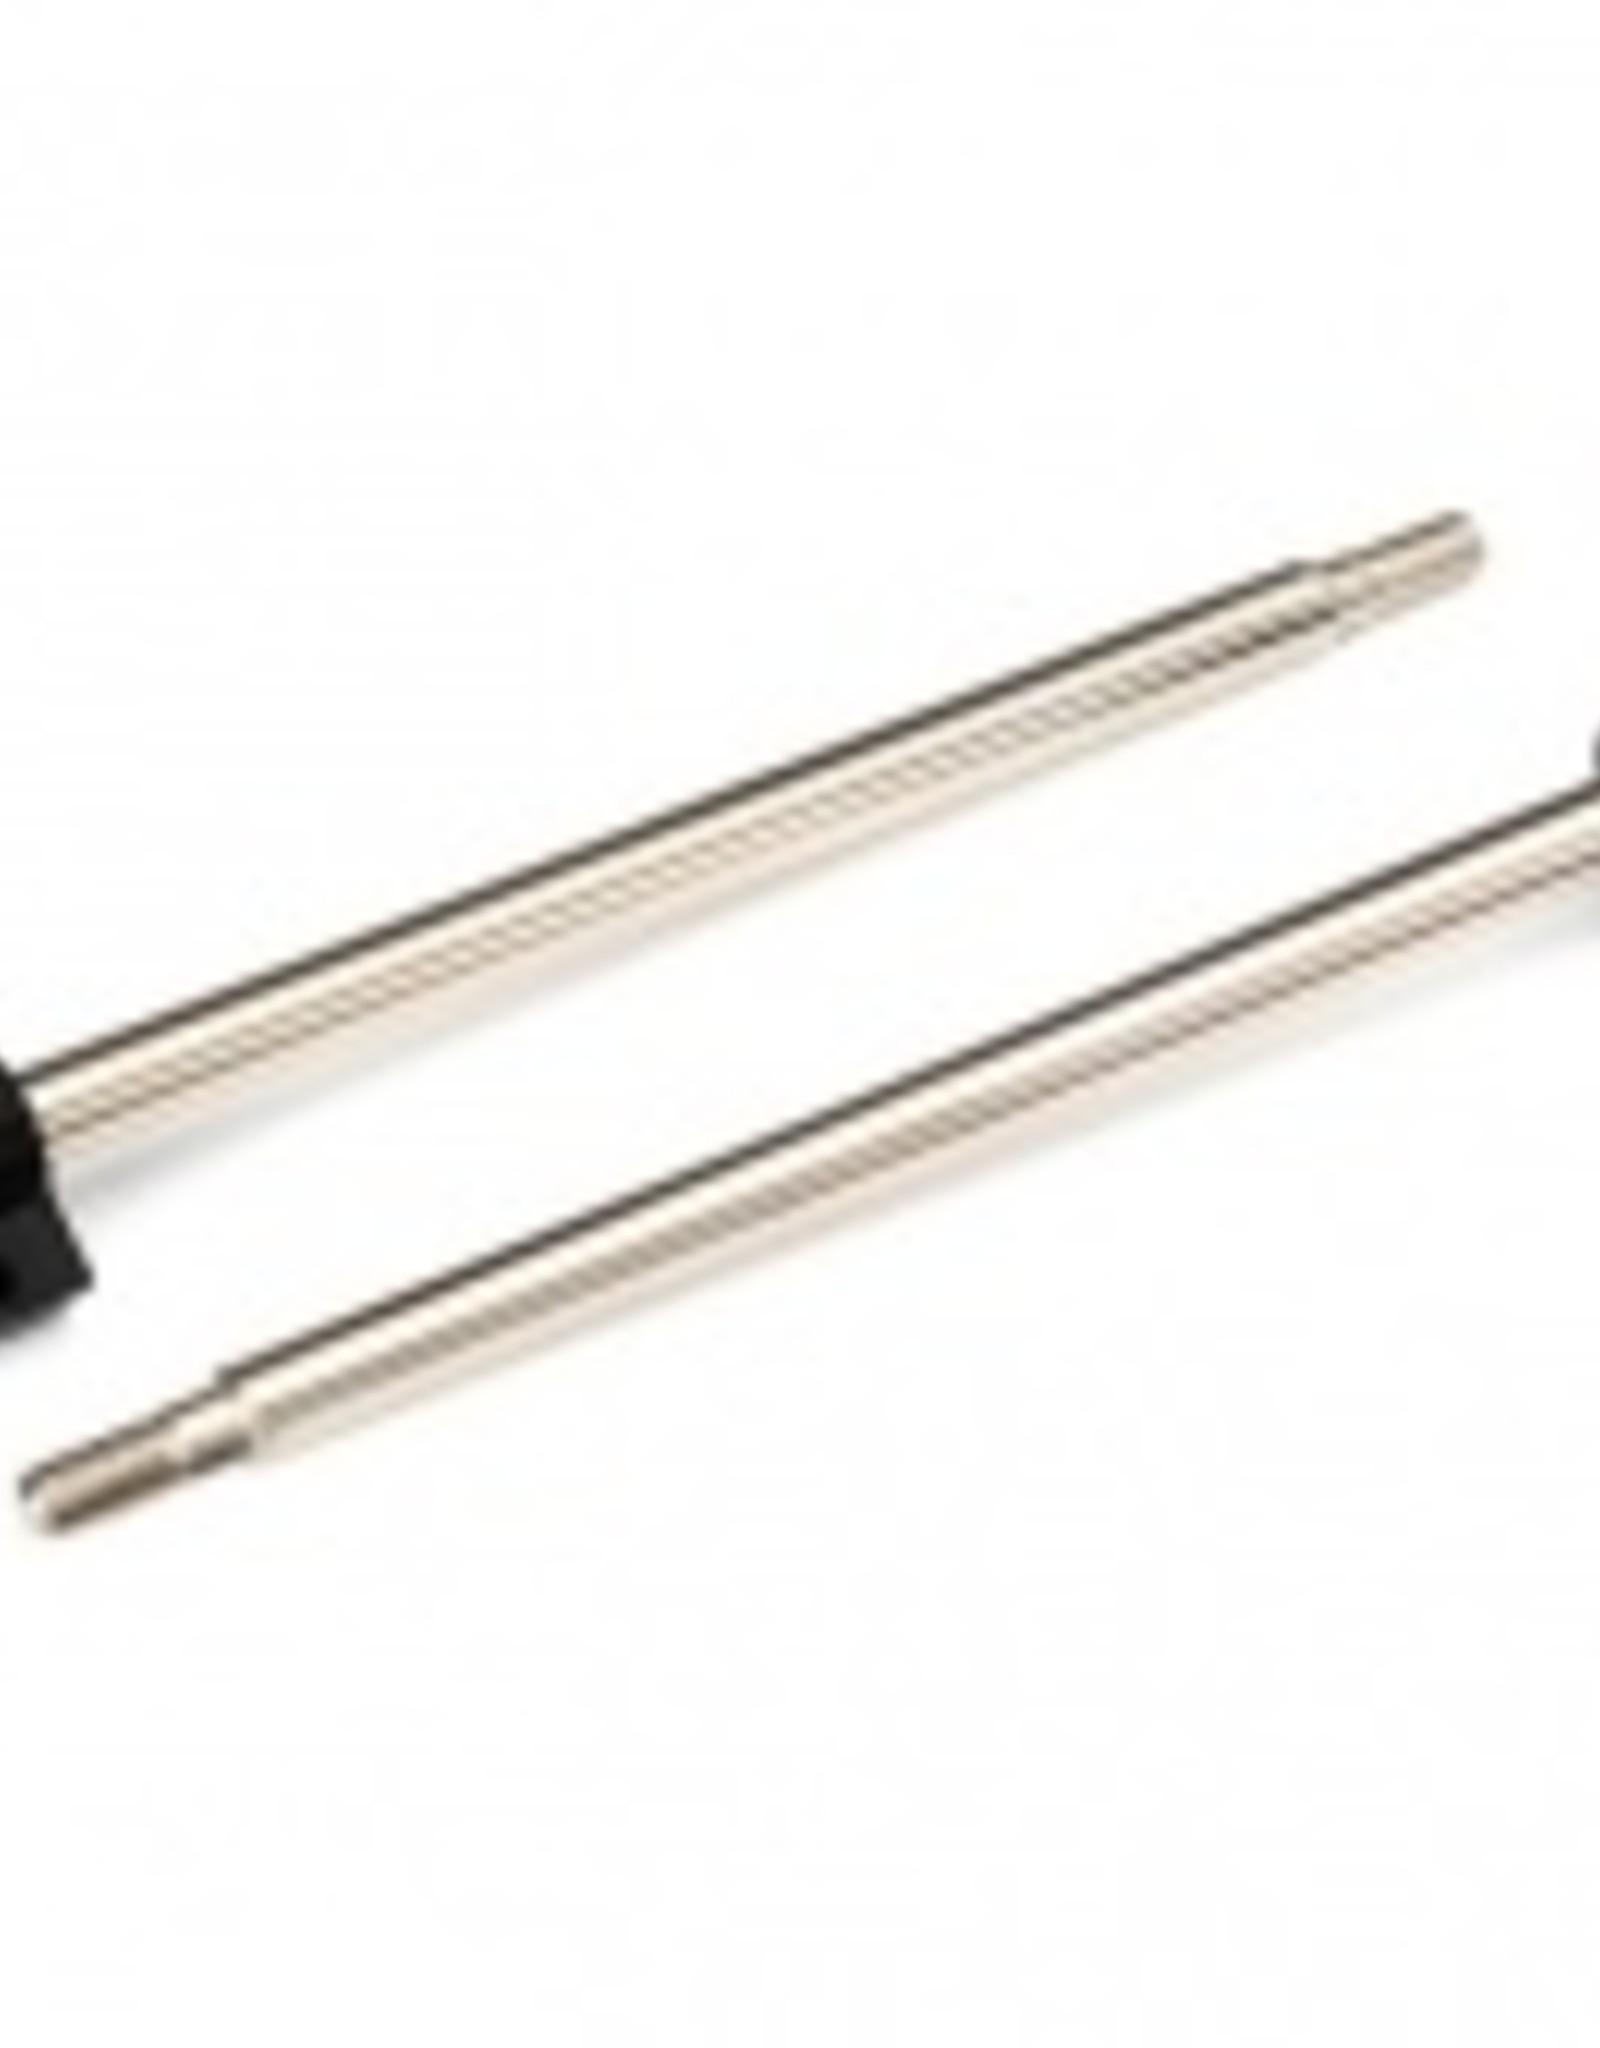 Traxxas Traxxas X-MAXX Shaft, GTX shock, 110mm (assembled with rod ends & hollow balls) (steel, chrome finish) (2)